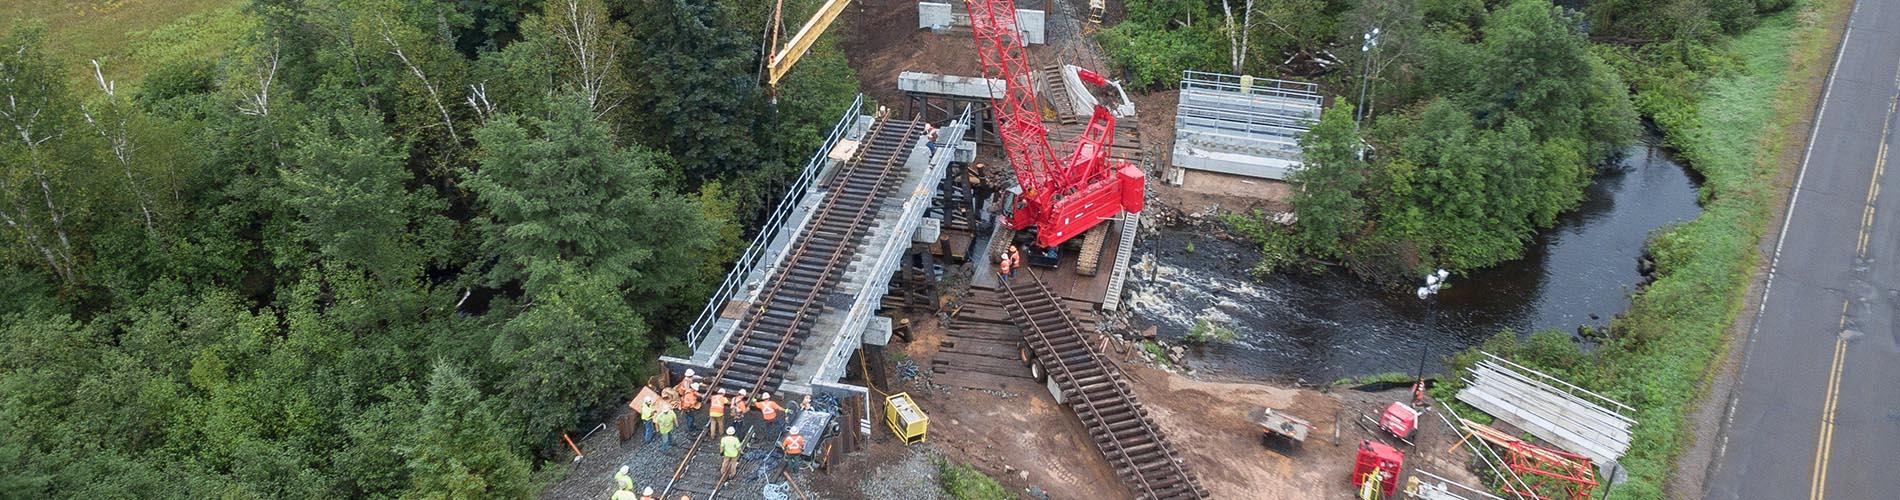 railroad construction services, railroad contractors, bridge replacements, bridge repairs, railroad bridge repairs, derailment assists, derailment cleanups,